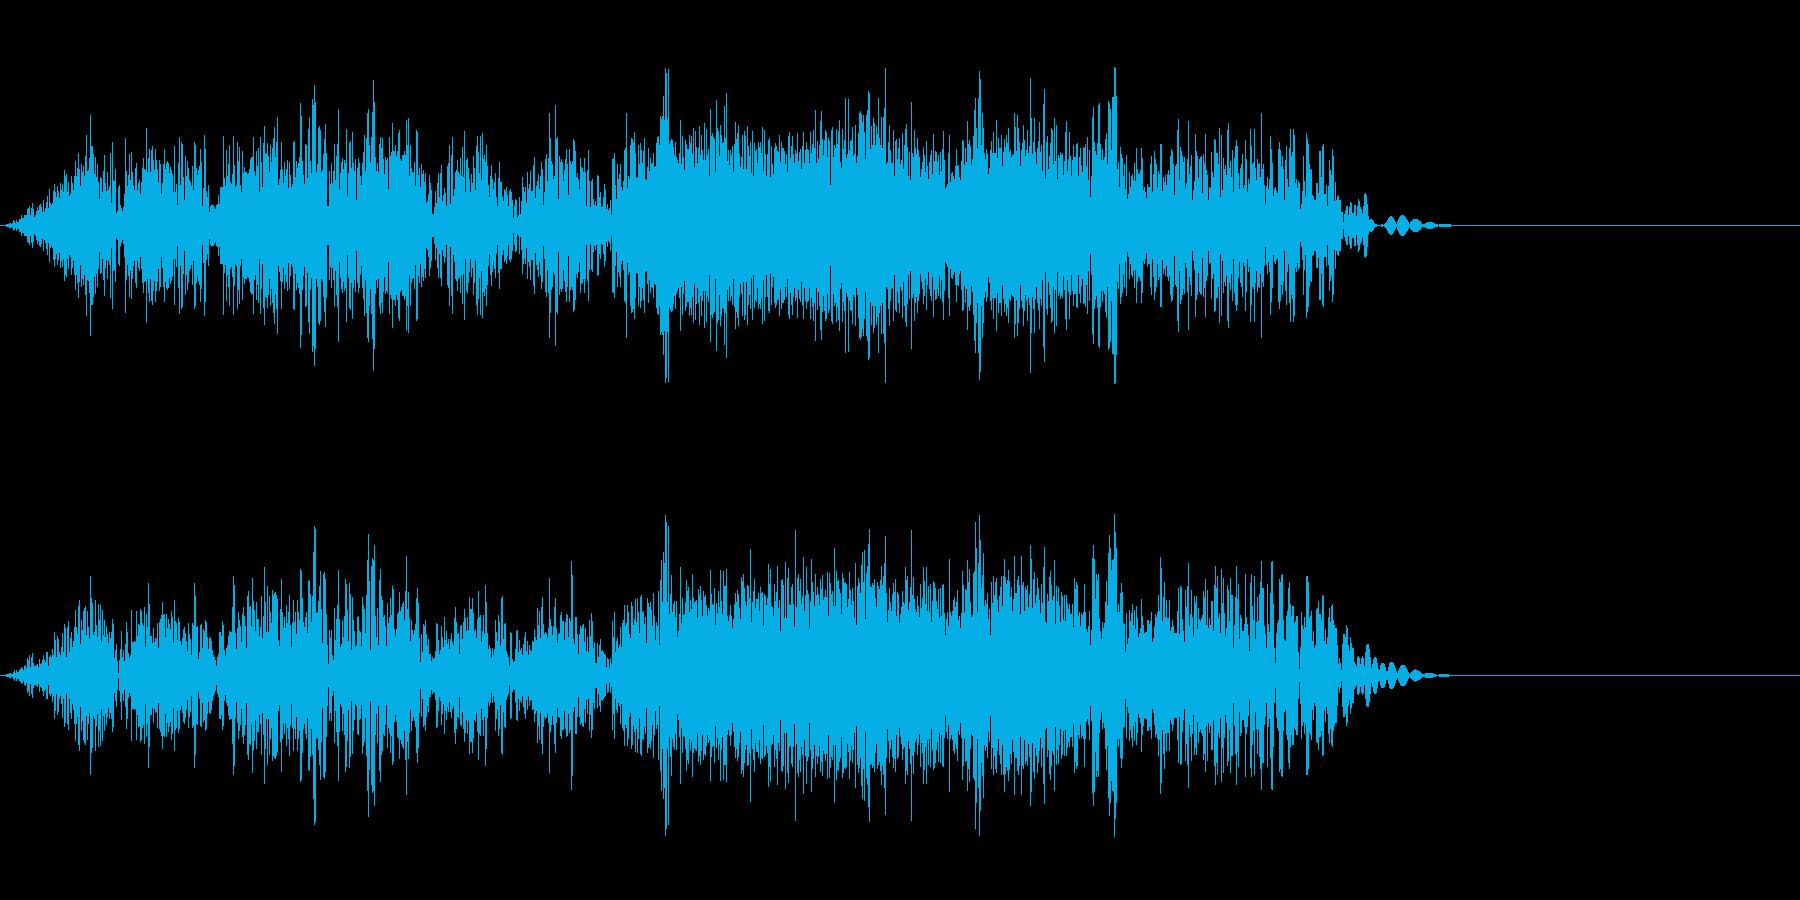 DJスクラッチ03_リバース音03の再生済みの波形